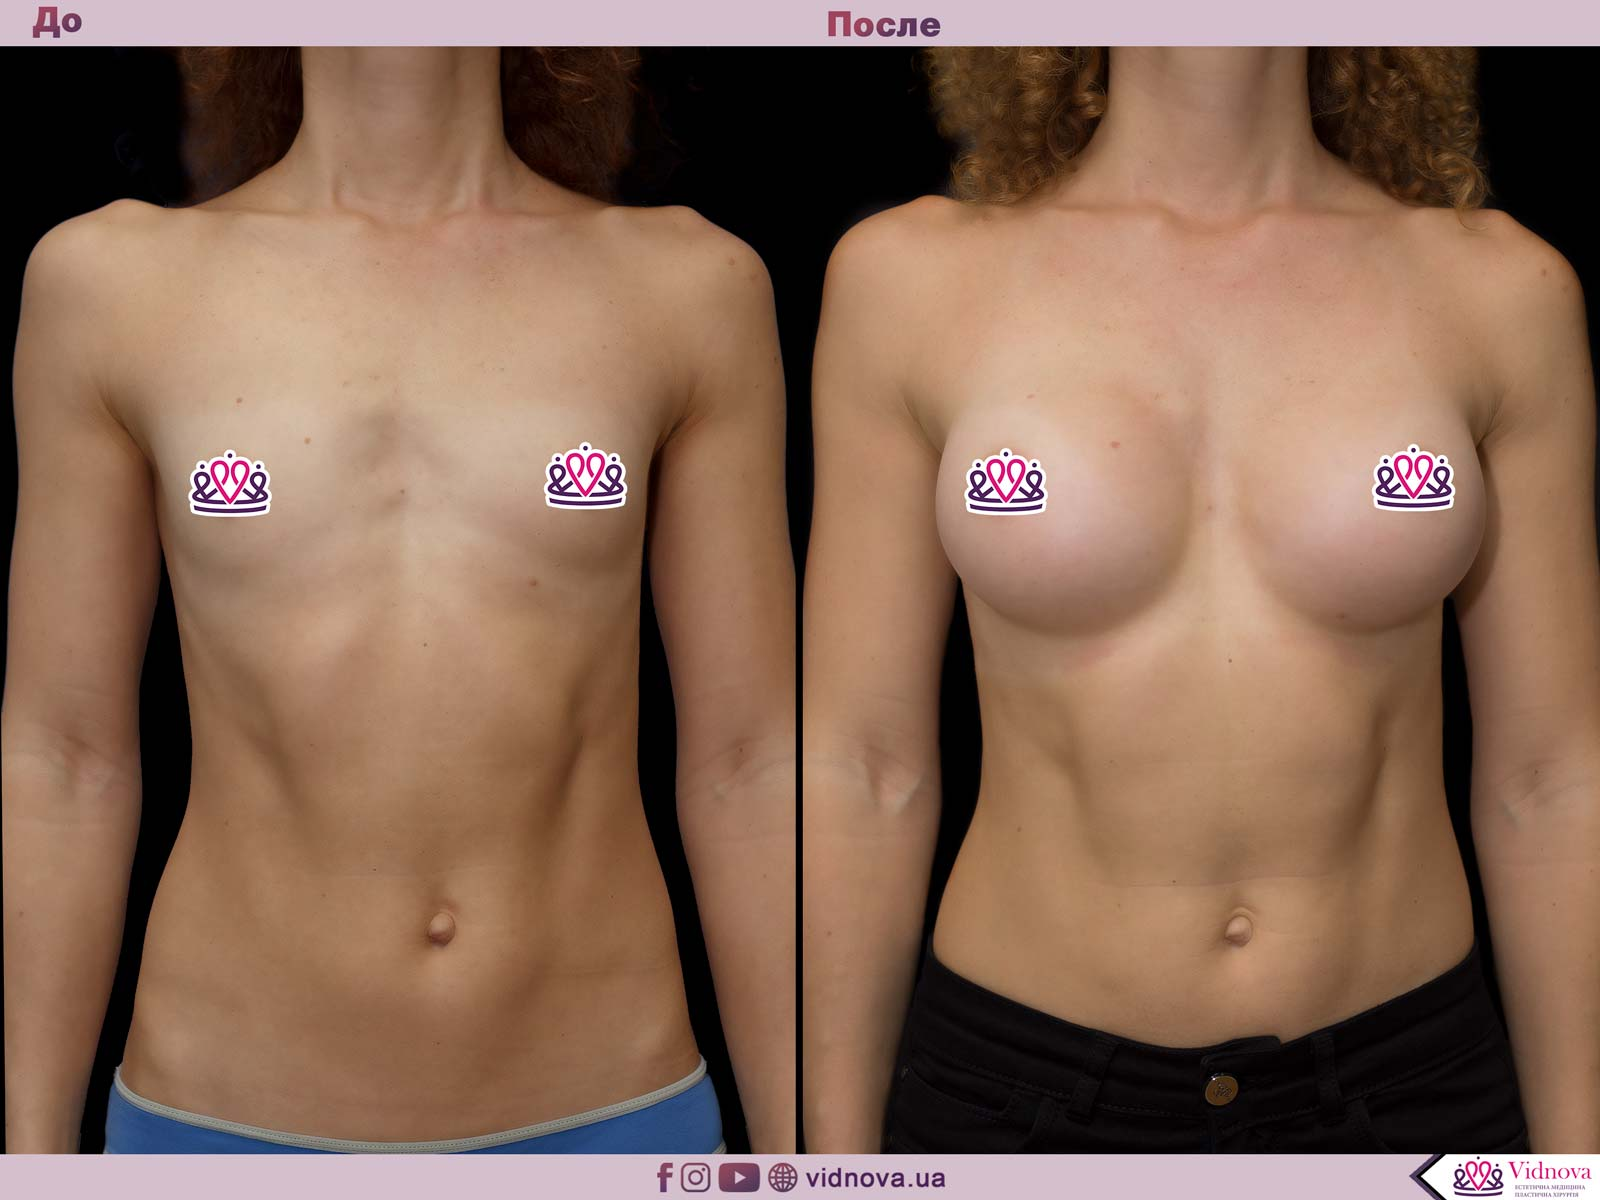 Увеличение груди: Фото ДО и ПОСЛЕ - Пример №36-1 - Клиника Vidnova